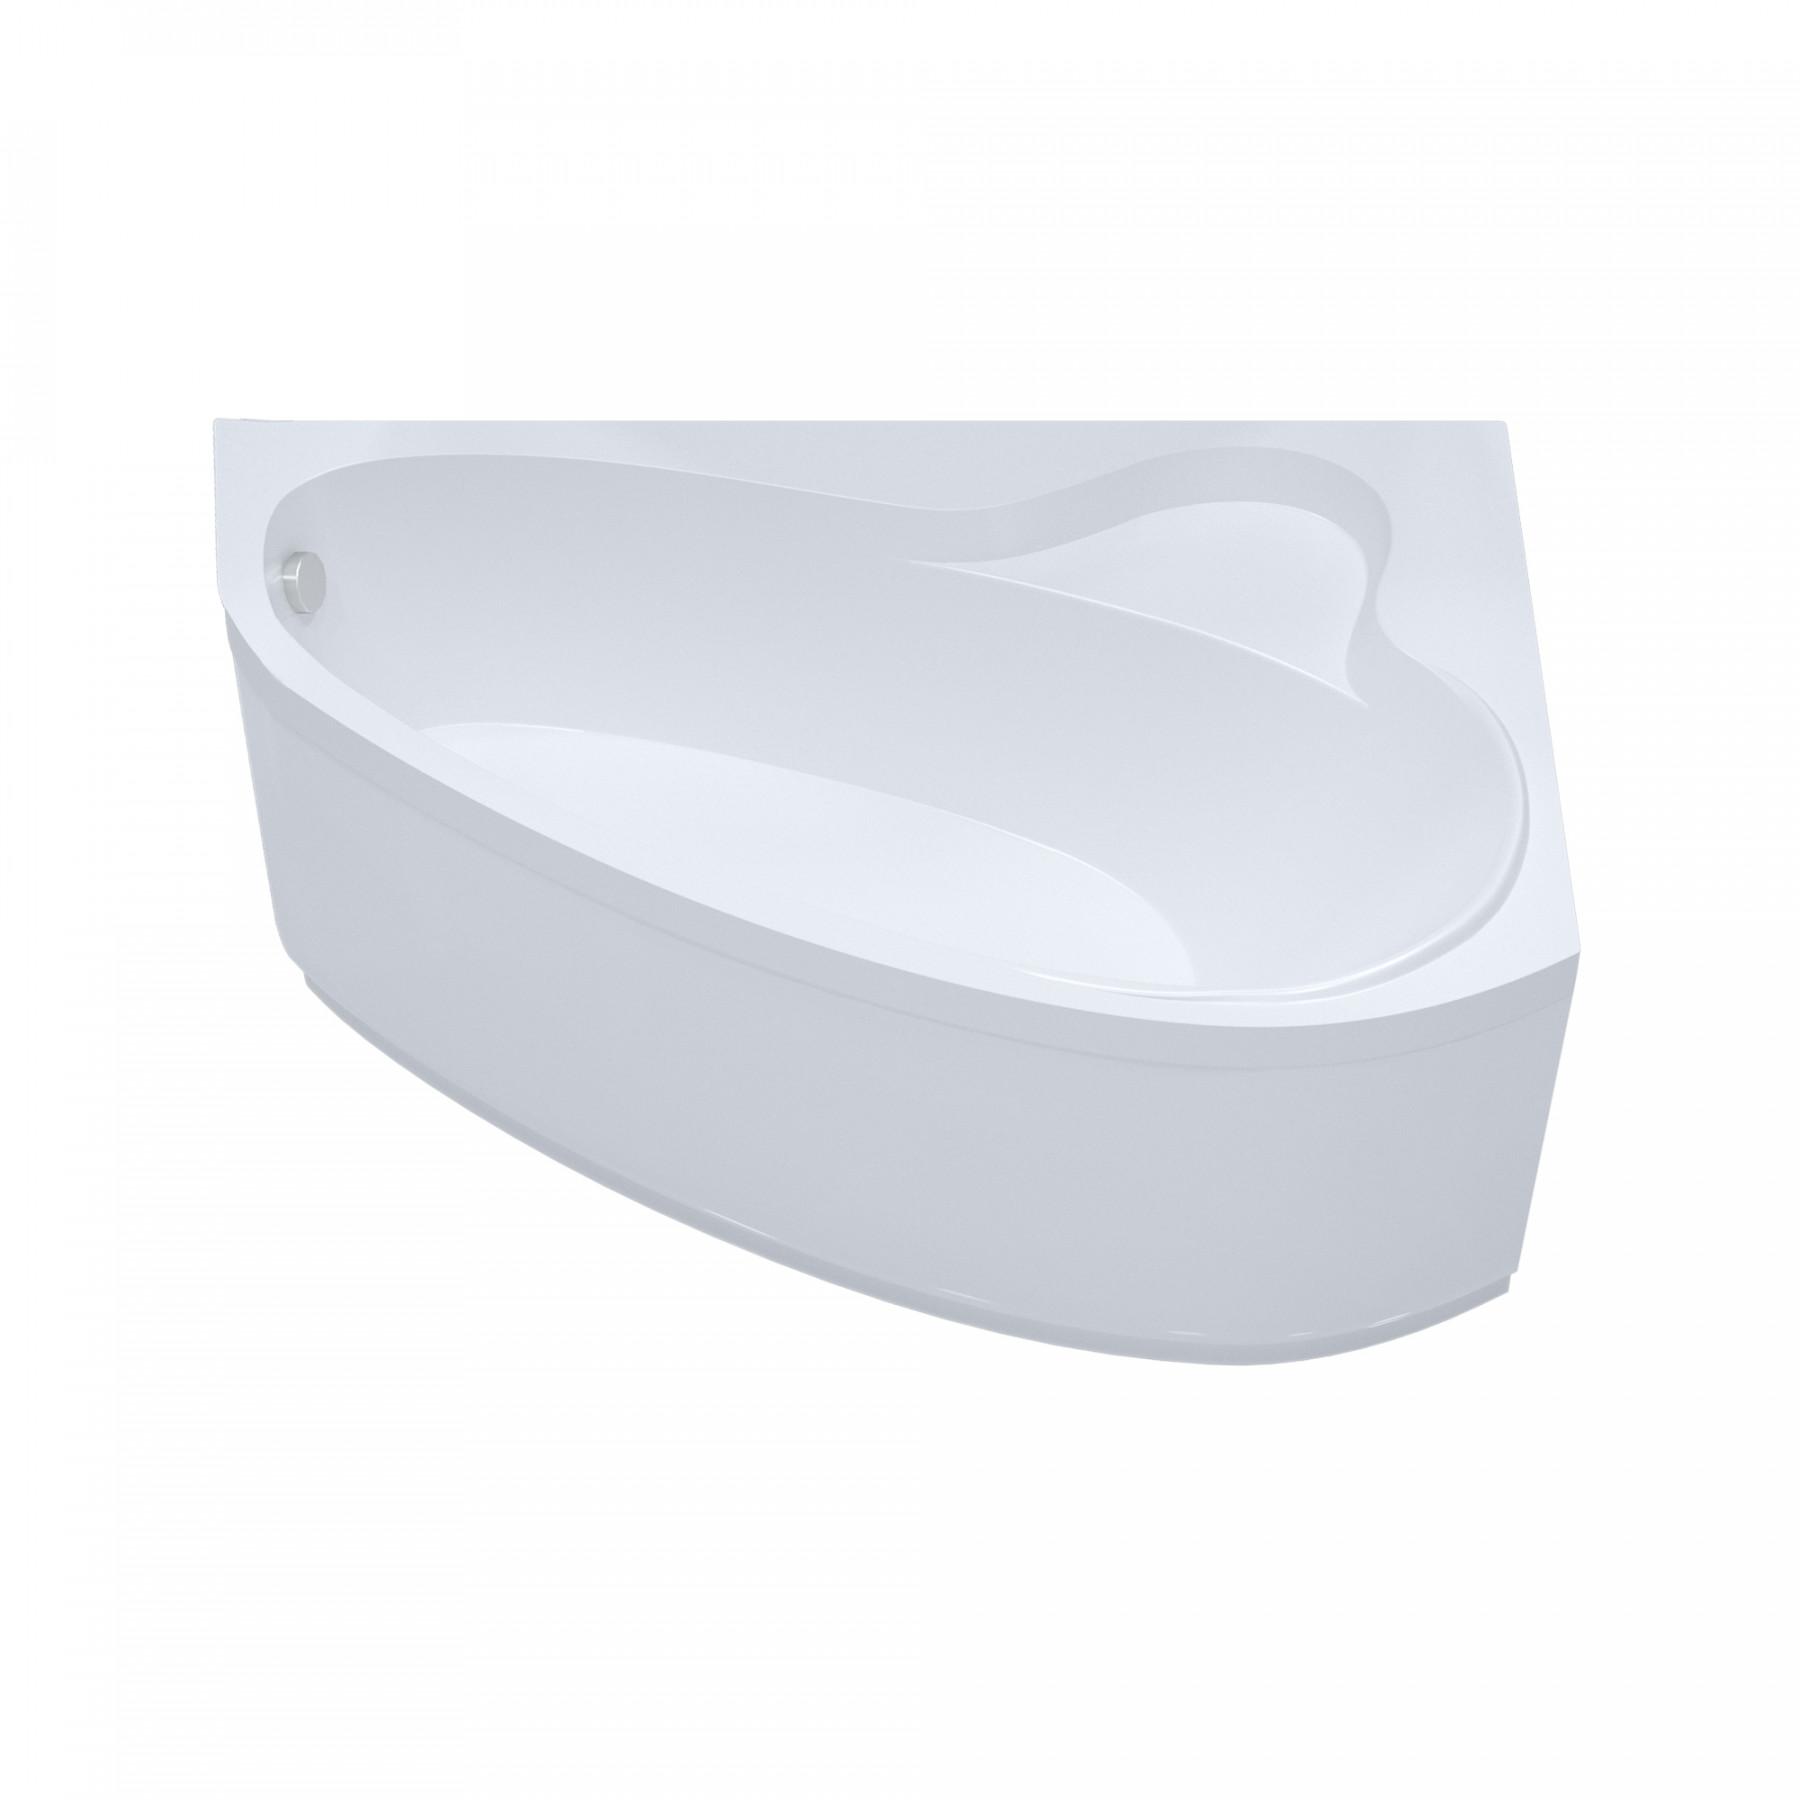 Акриловая ванна Triton Пеарл-шелл 160x104 левая